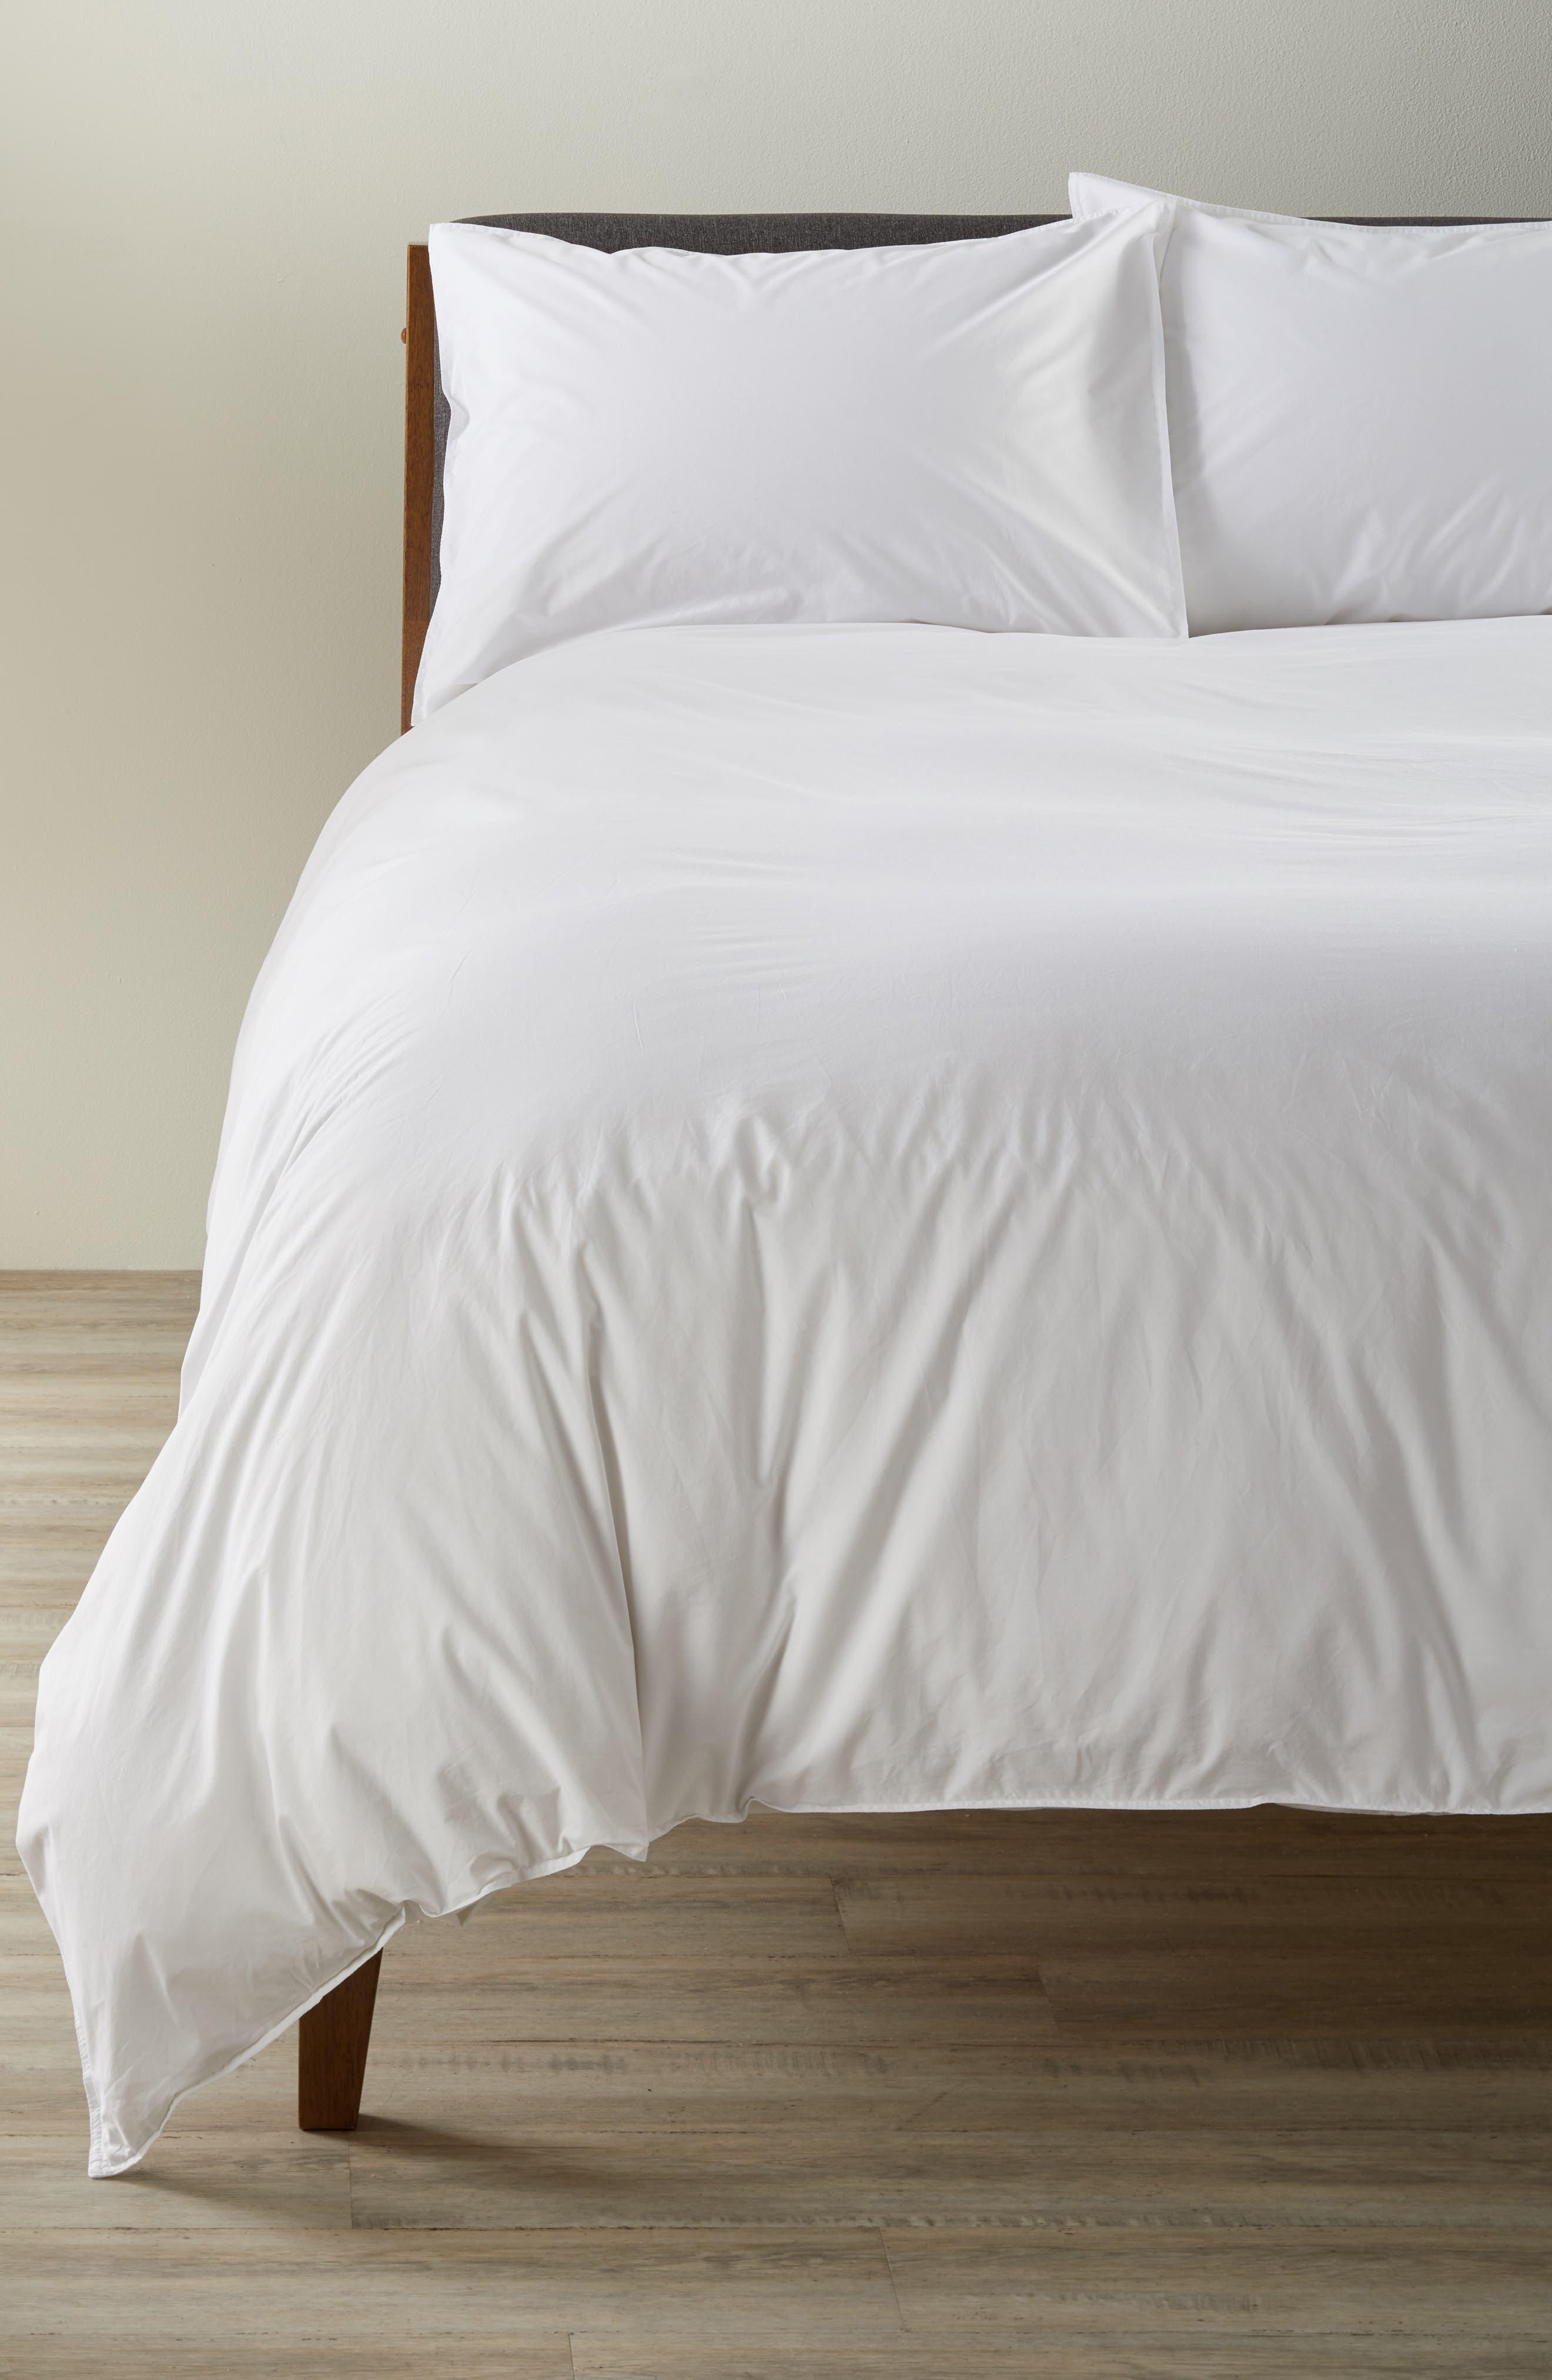 Alternate Image 1 Selected - Pom Pom at Home Parker Cotton Duvet Cover & Sham Set